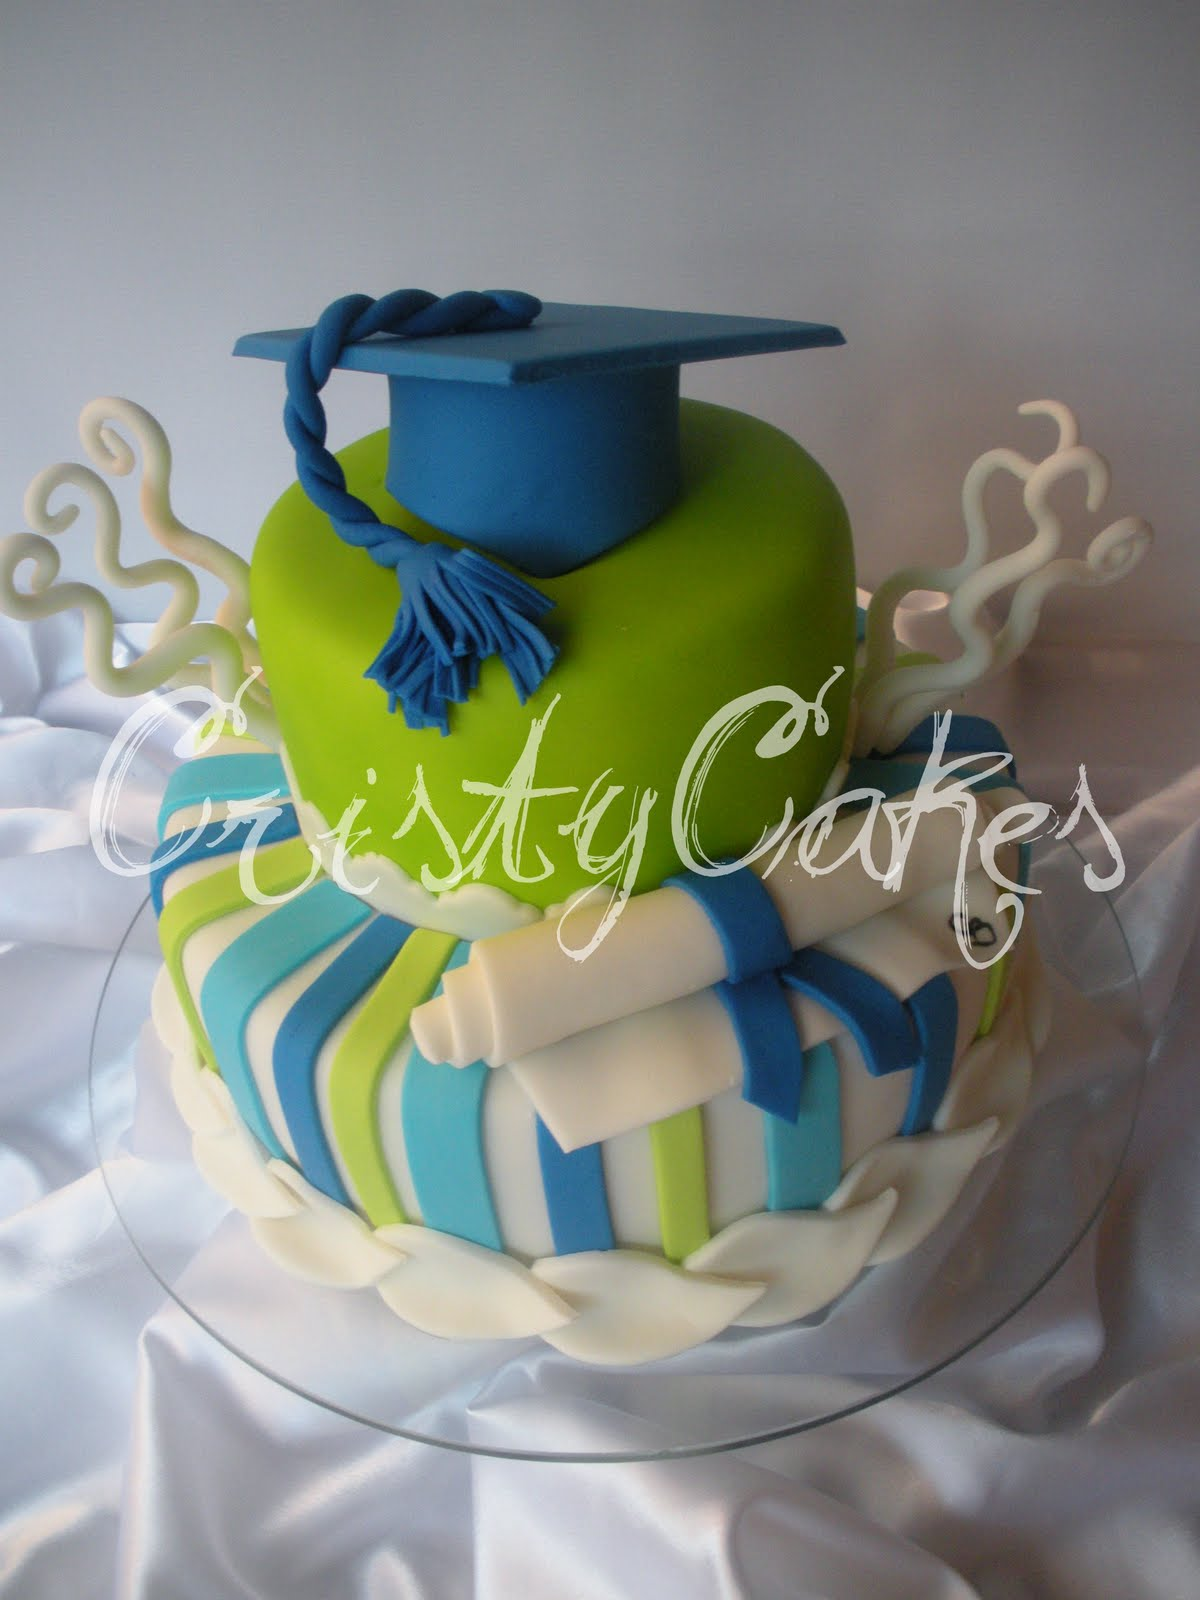 Decoracion Graduacion Bachiller ~ Cristy s Cakes Graduaciones, Julio el mes de las Graduaciones